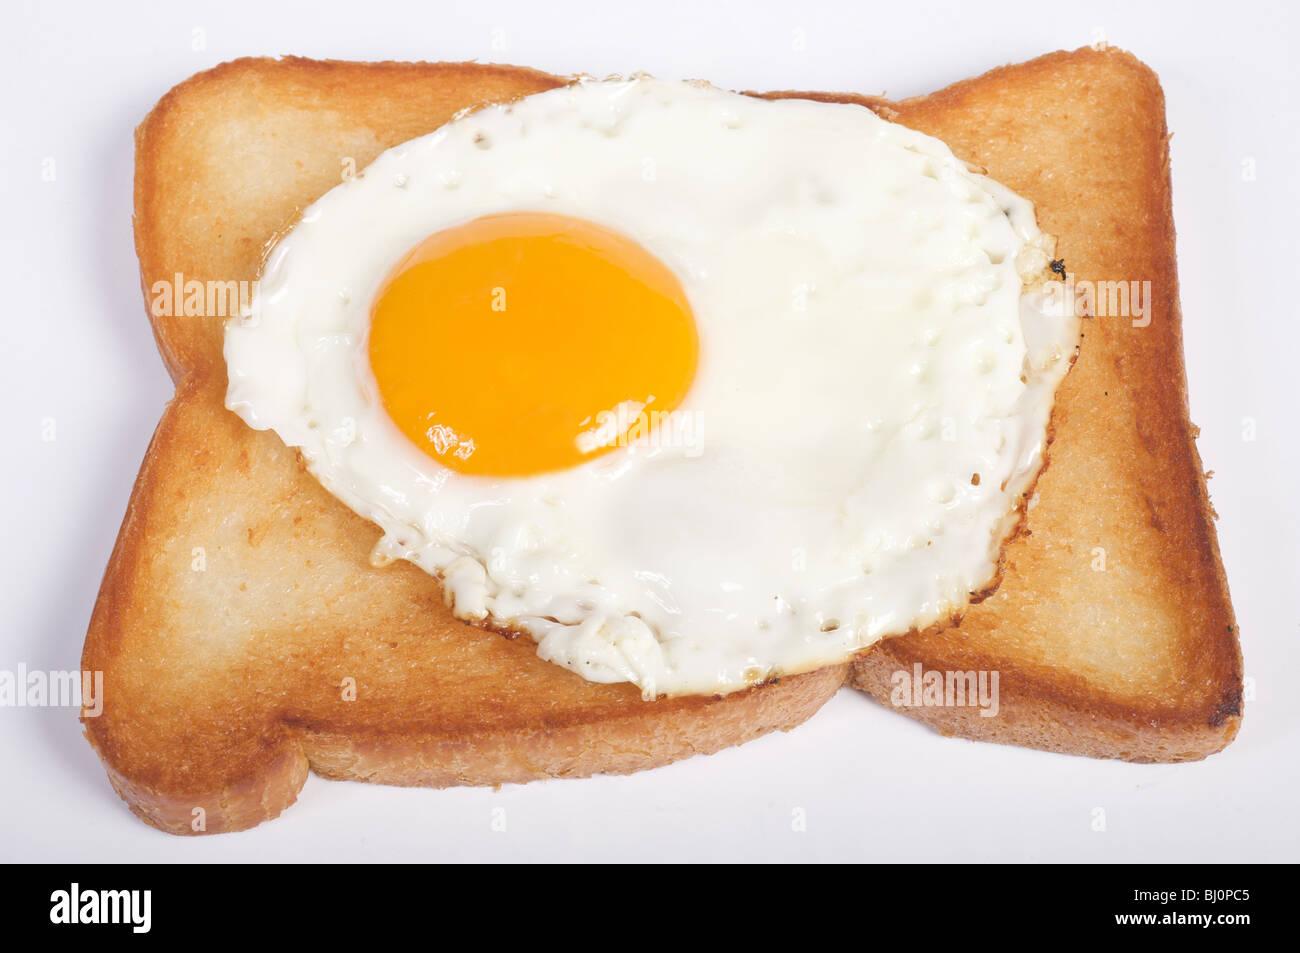 Free range egg on fried bread - Stock Image